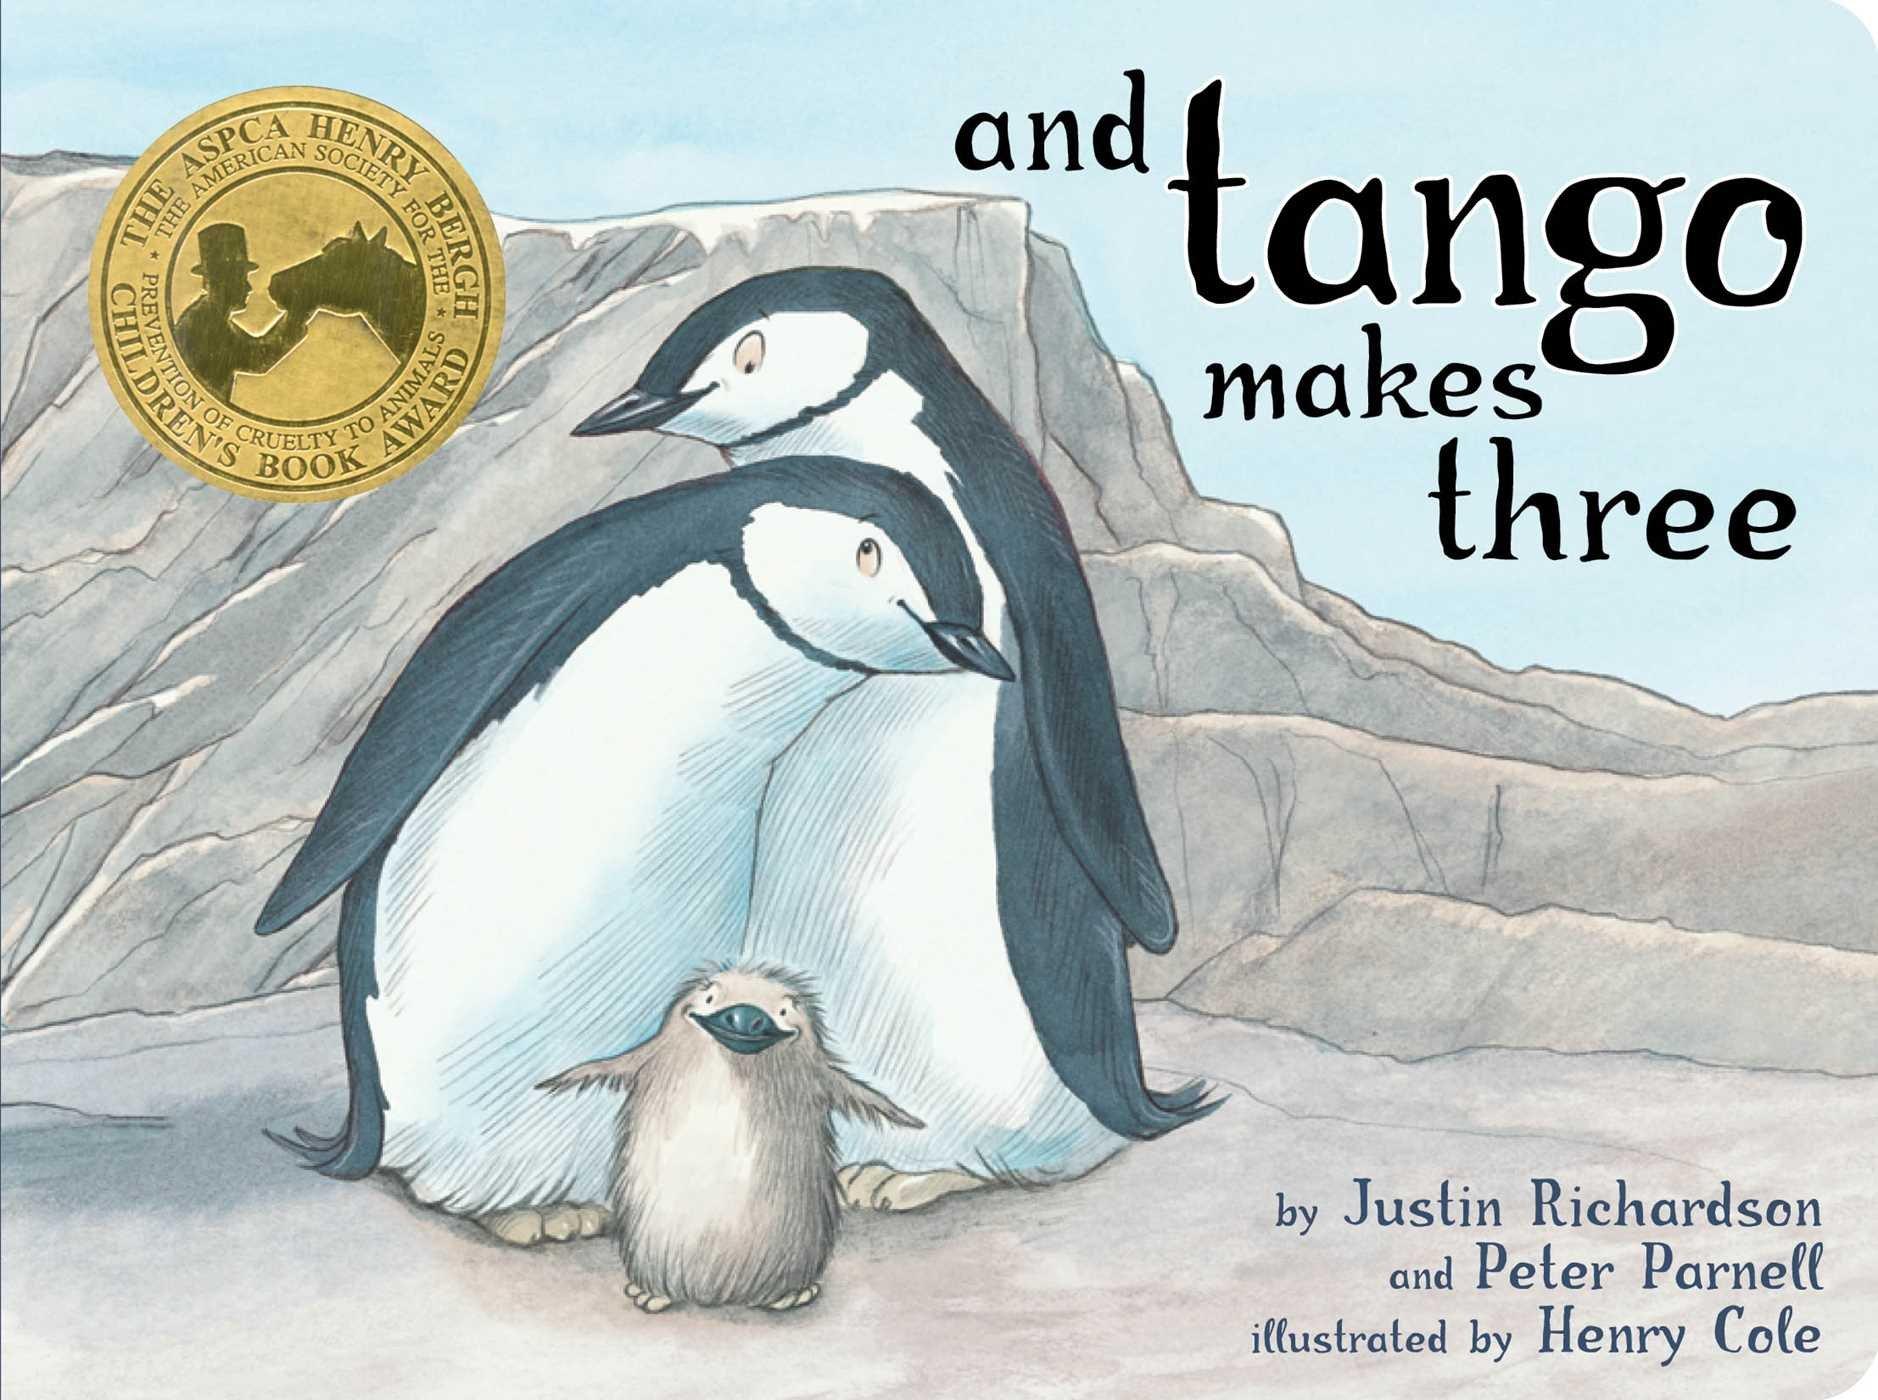 And Tango Makes Three- By Justin Richardson